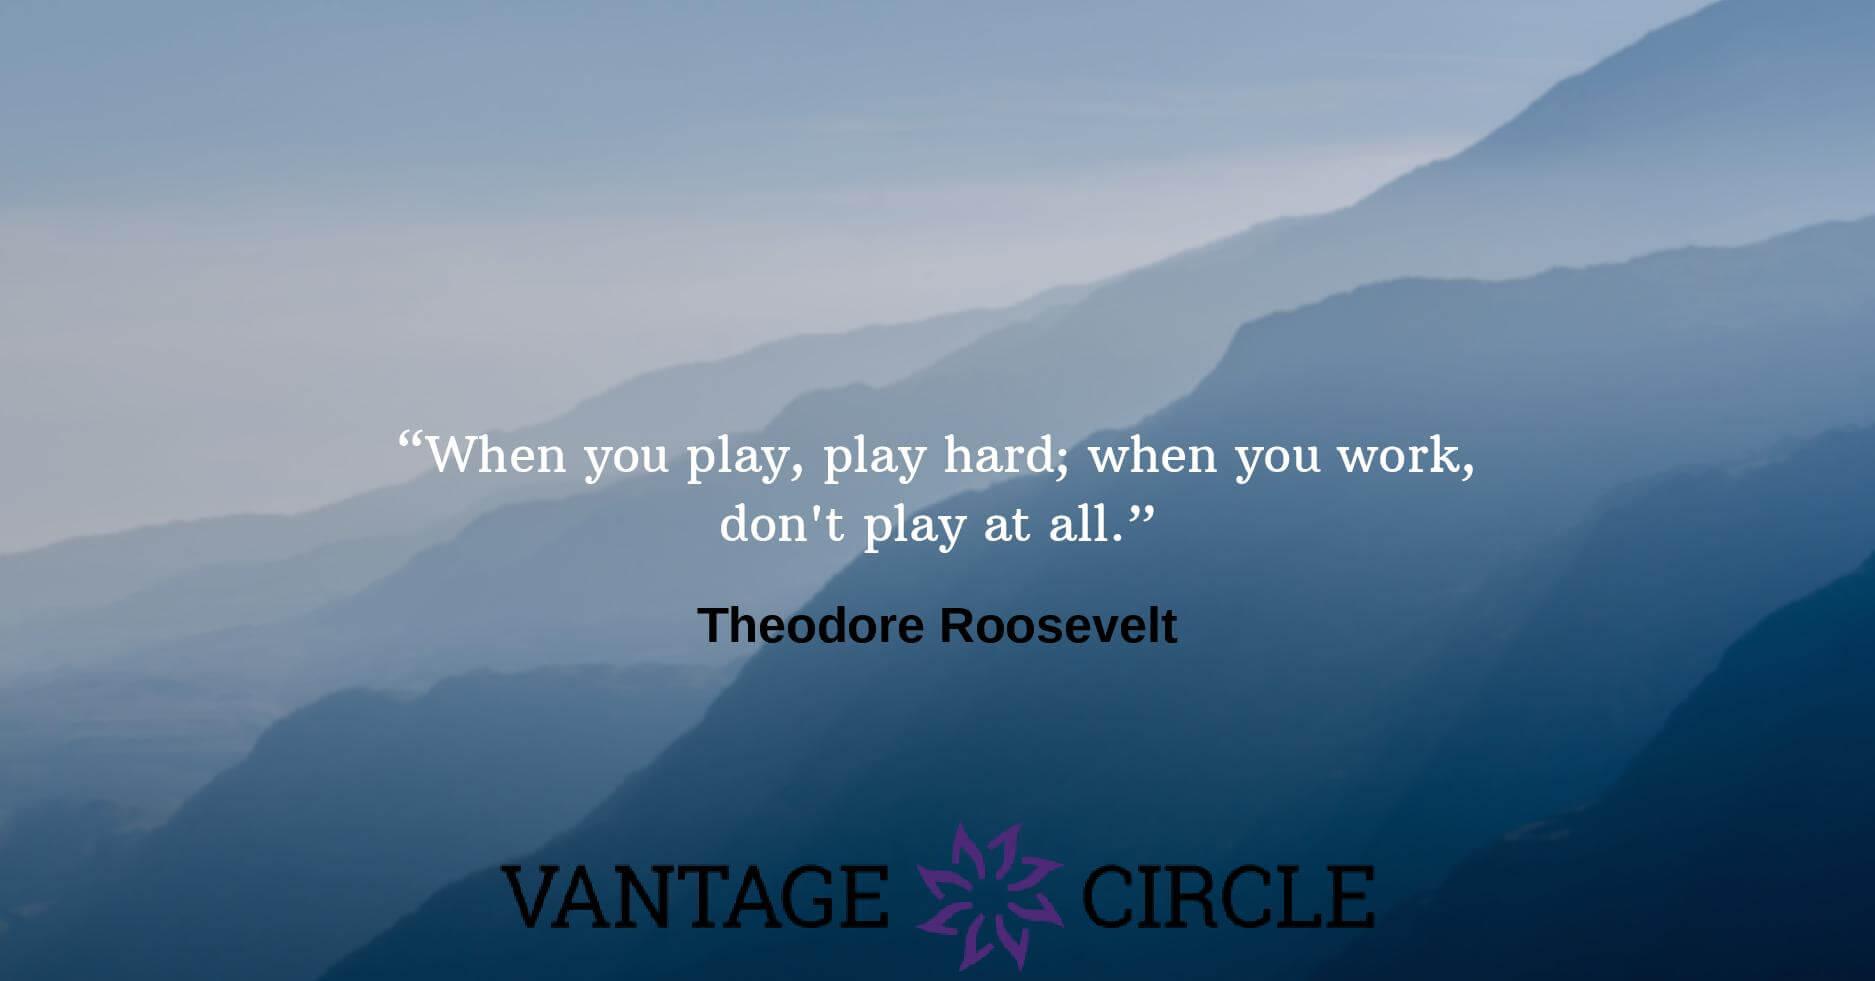 Employee-motivational-quotes-Theodore-Roosevelt